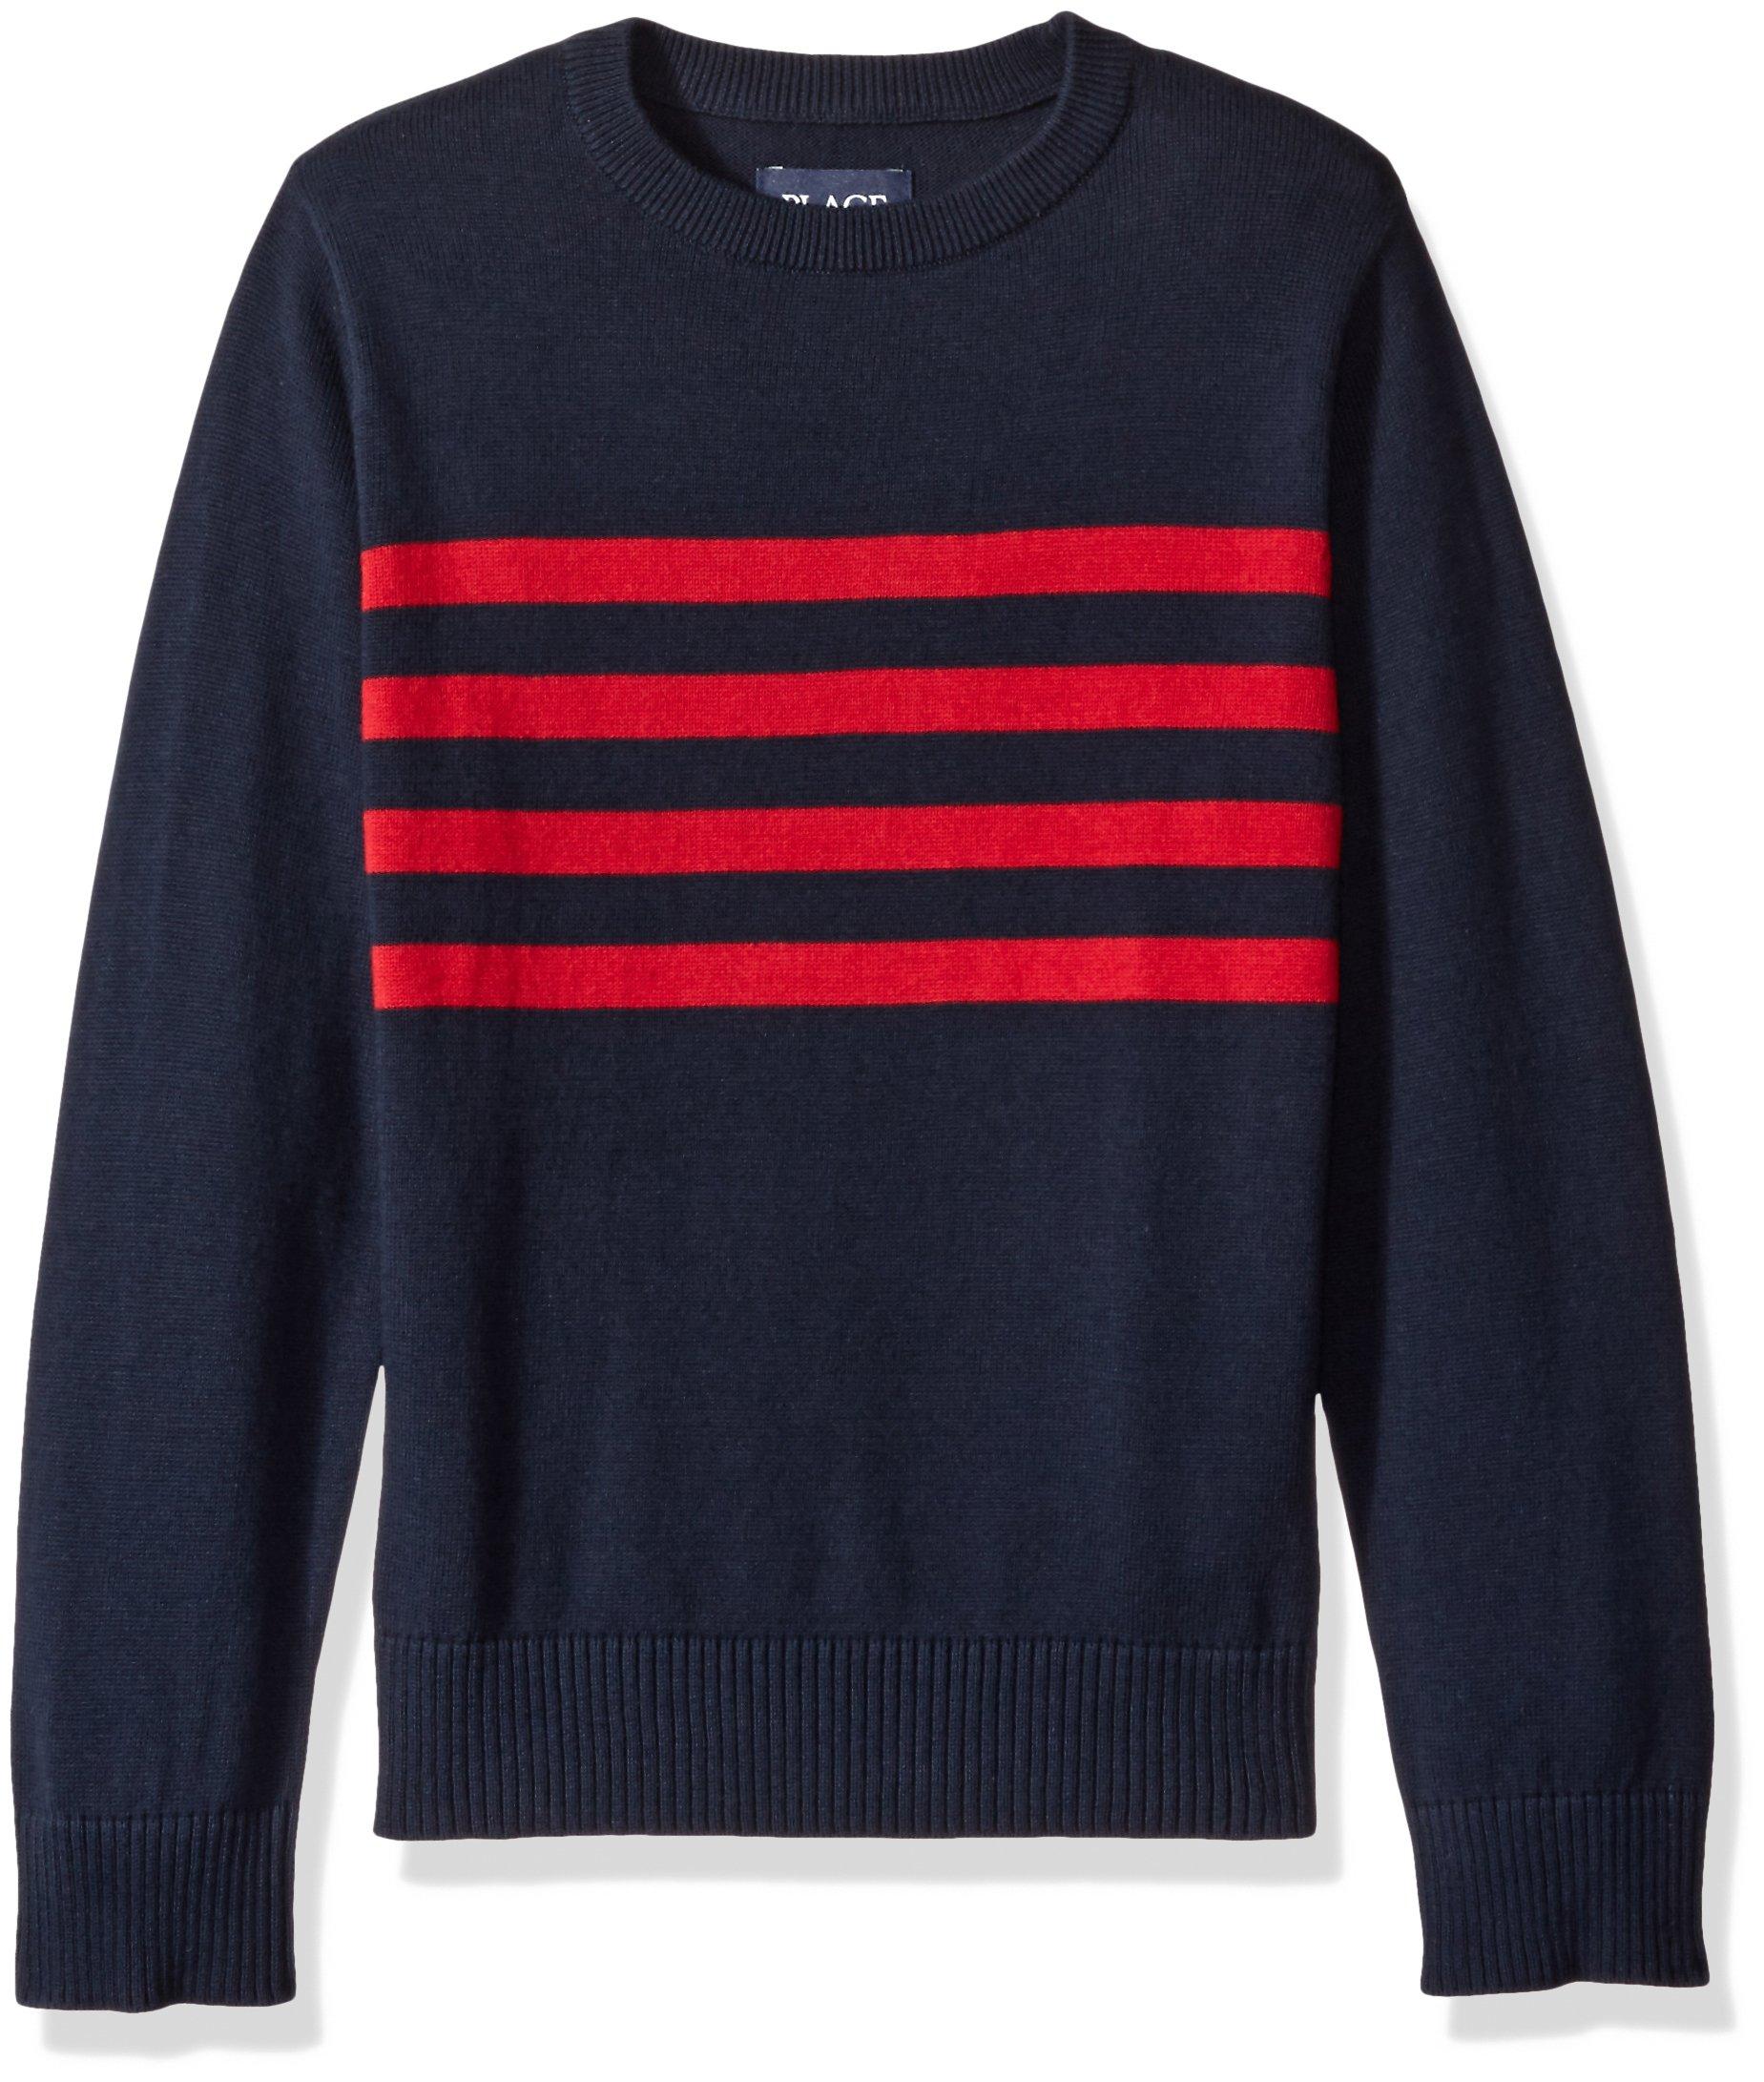 The Children's Place Boys' Big Crewneck Sweater, Tidal, Medium/7/8